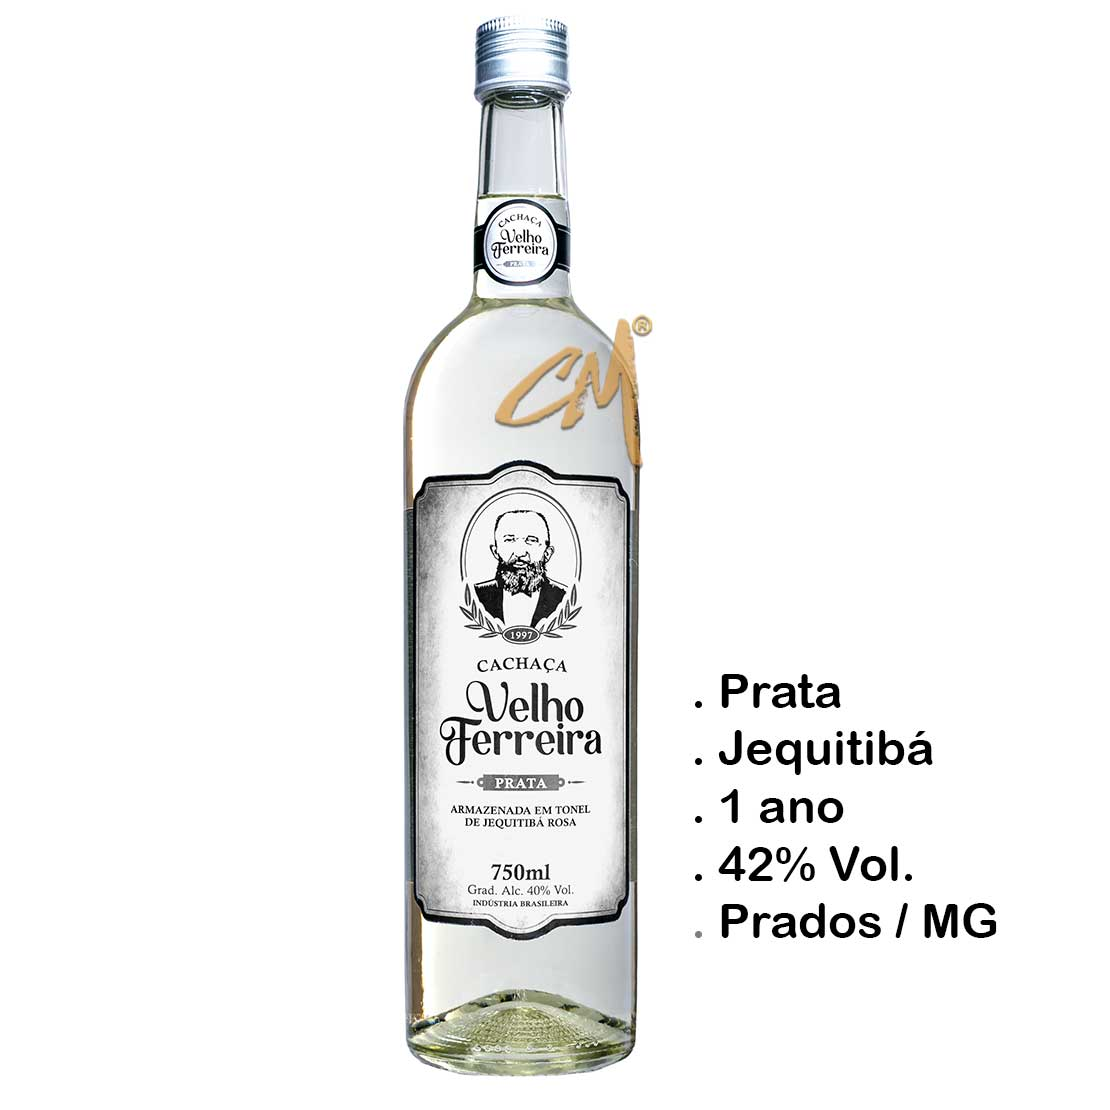 Cachaça Velho Ferreira Prata 750 ml   (Prados - MG)